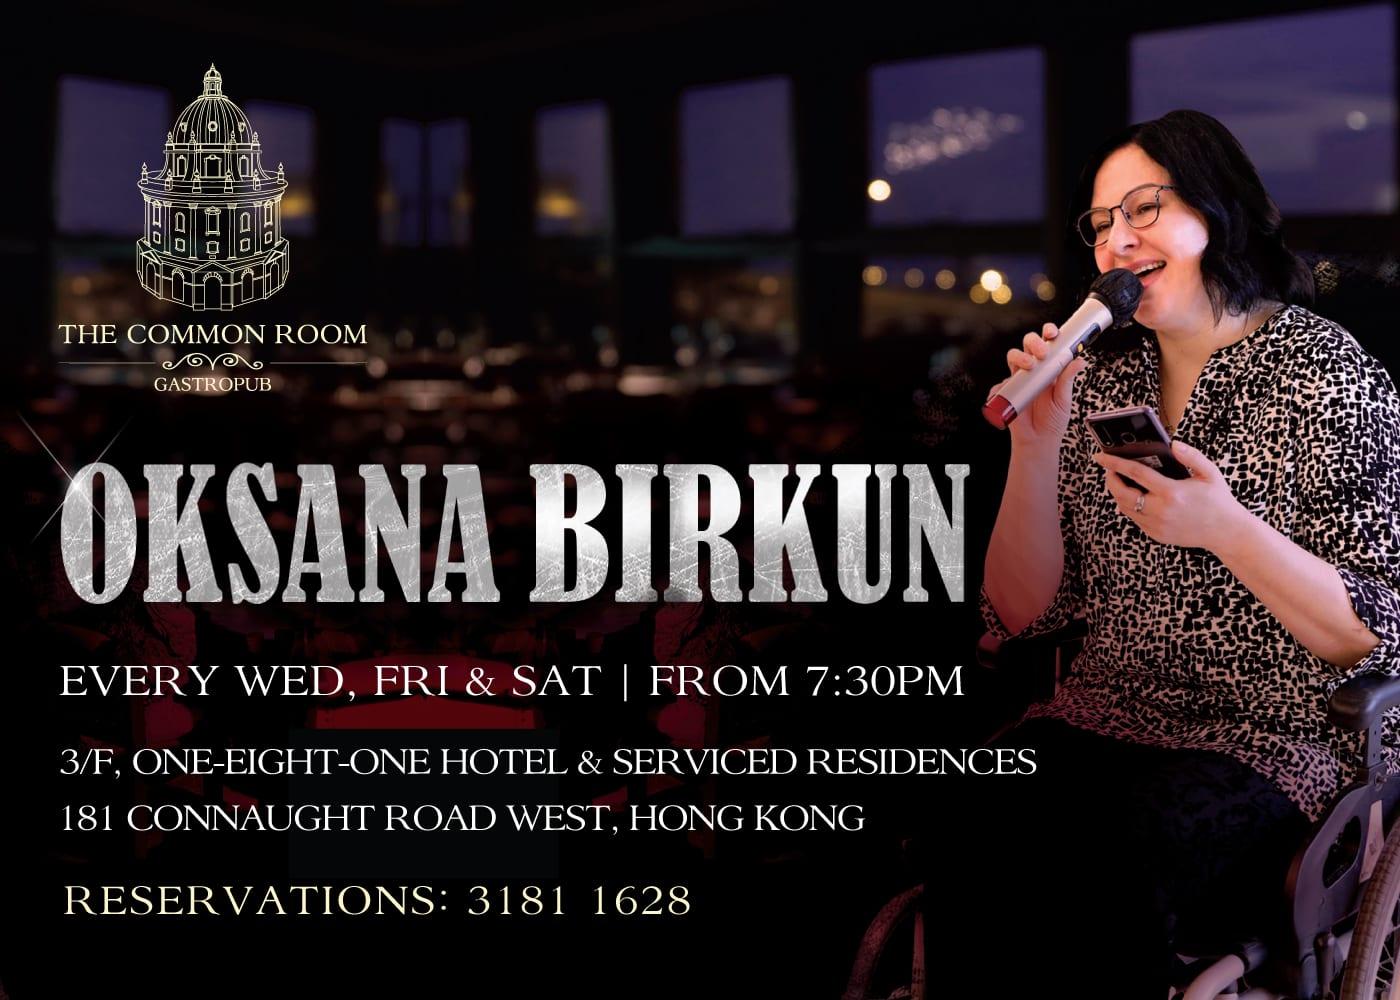 Live Music Night by Oksana Birkun